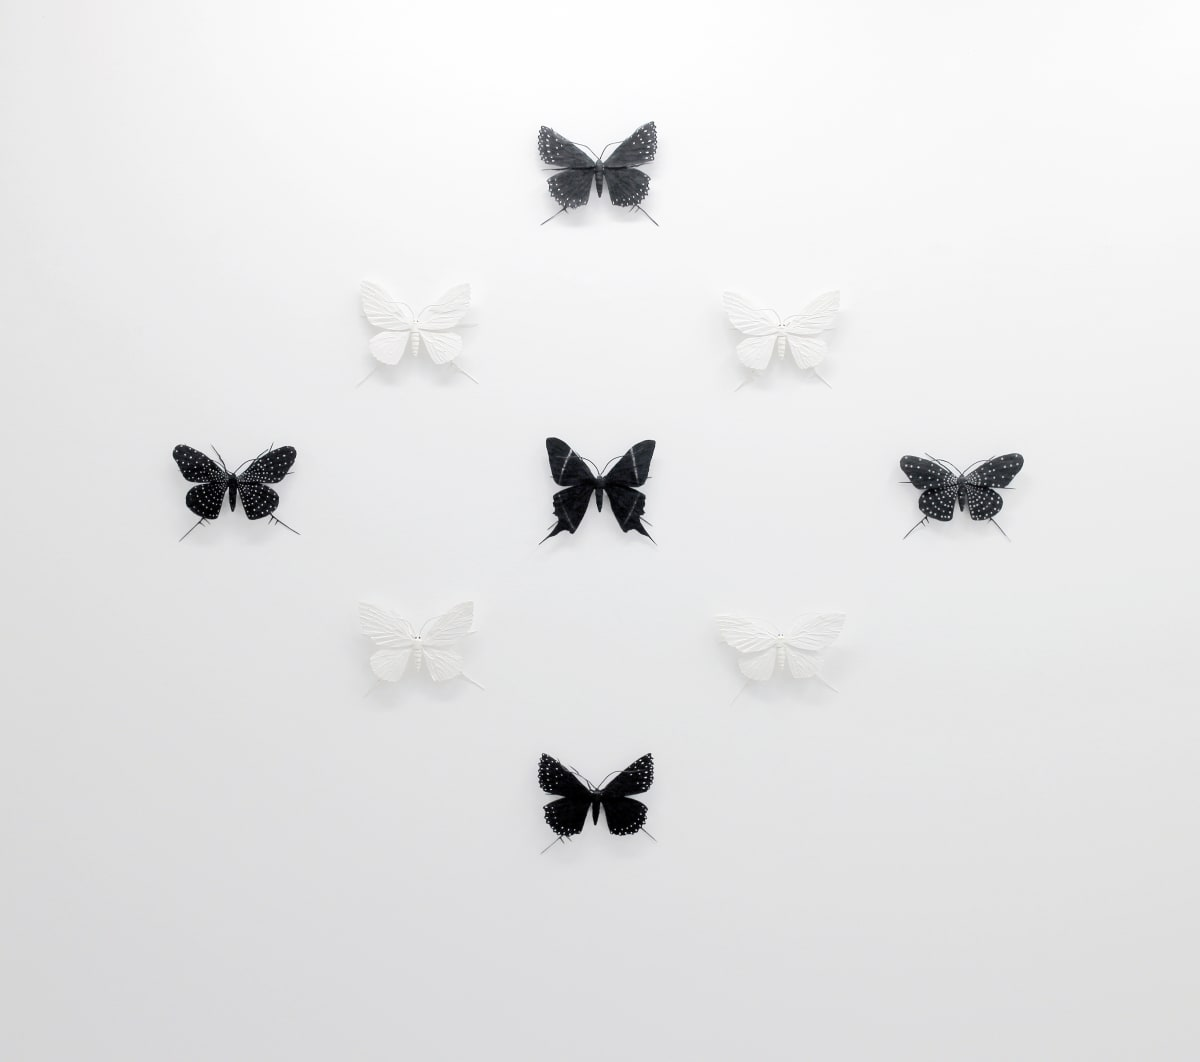 Elizabeth THOMSON The Black-and-Whites (I), 2017 Mixed media 47.2 x 53.5 in 120 x 136 cm